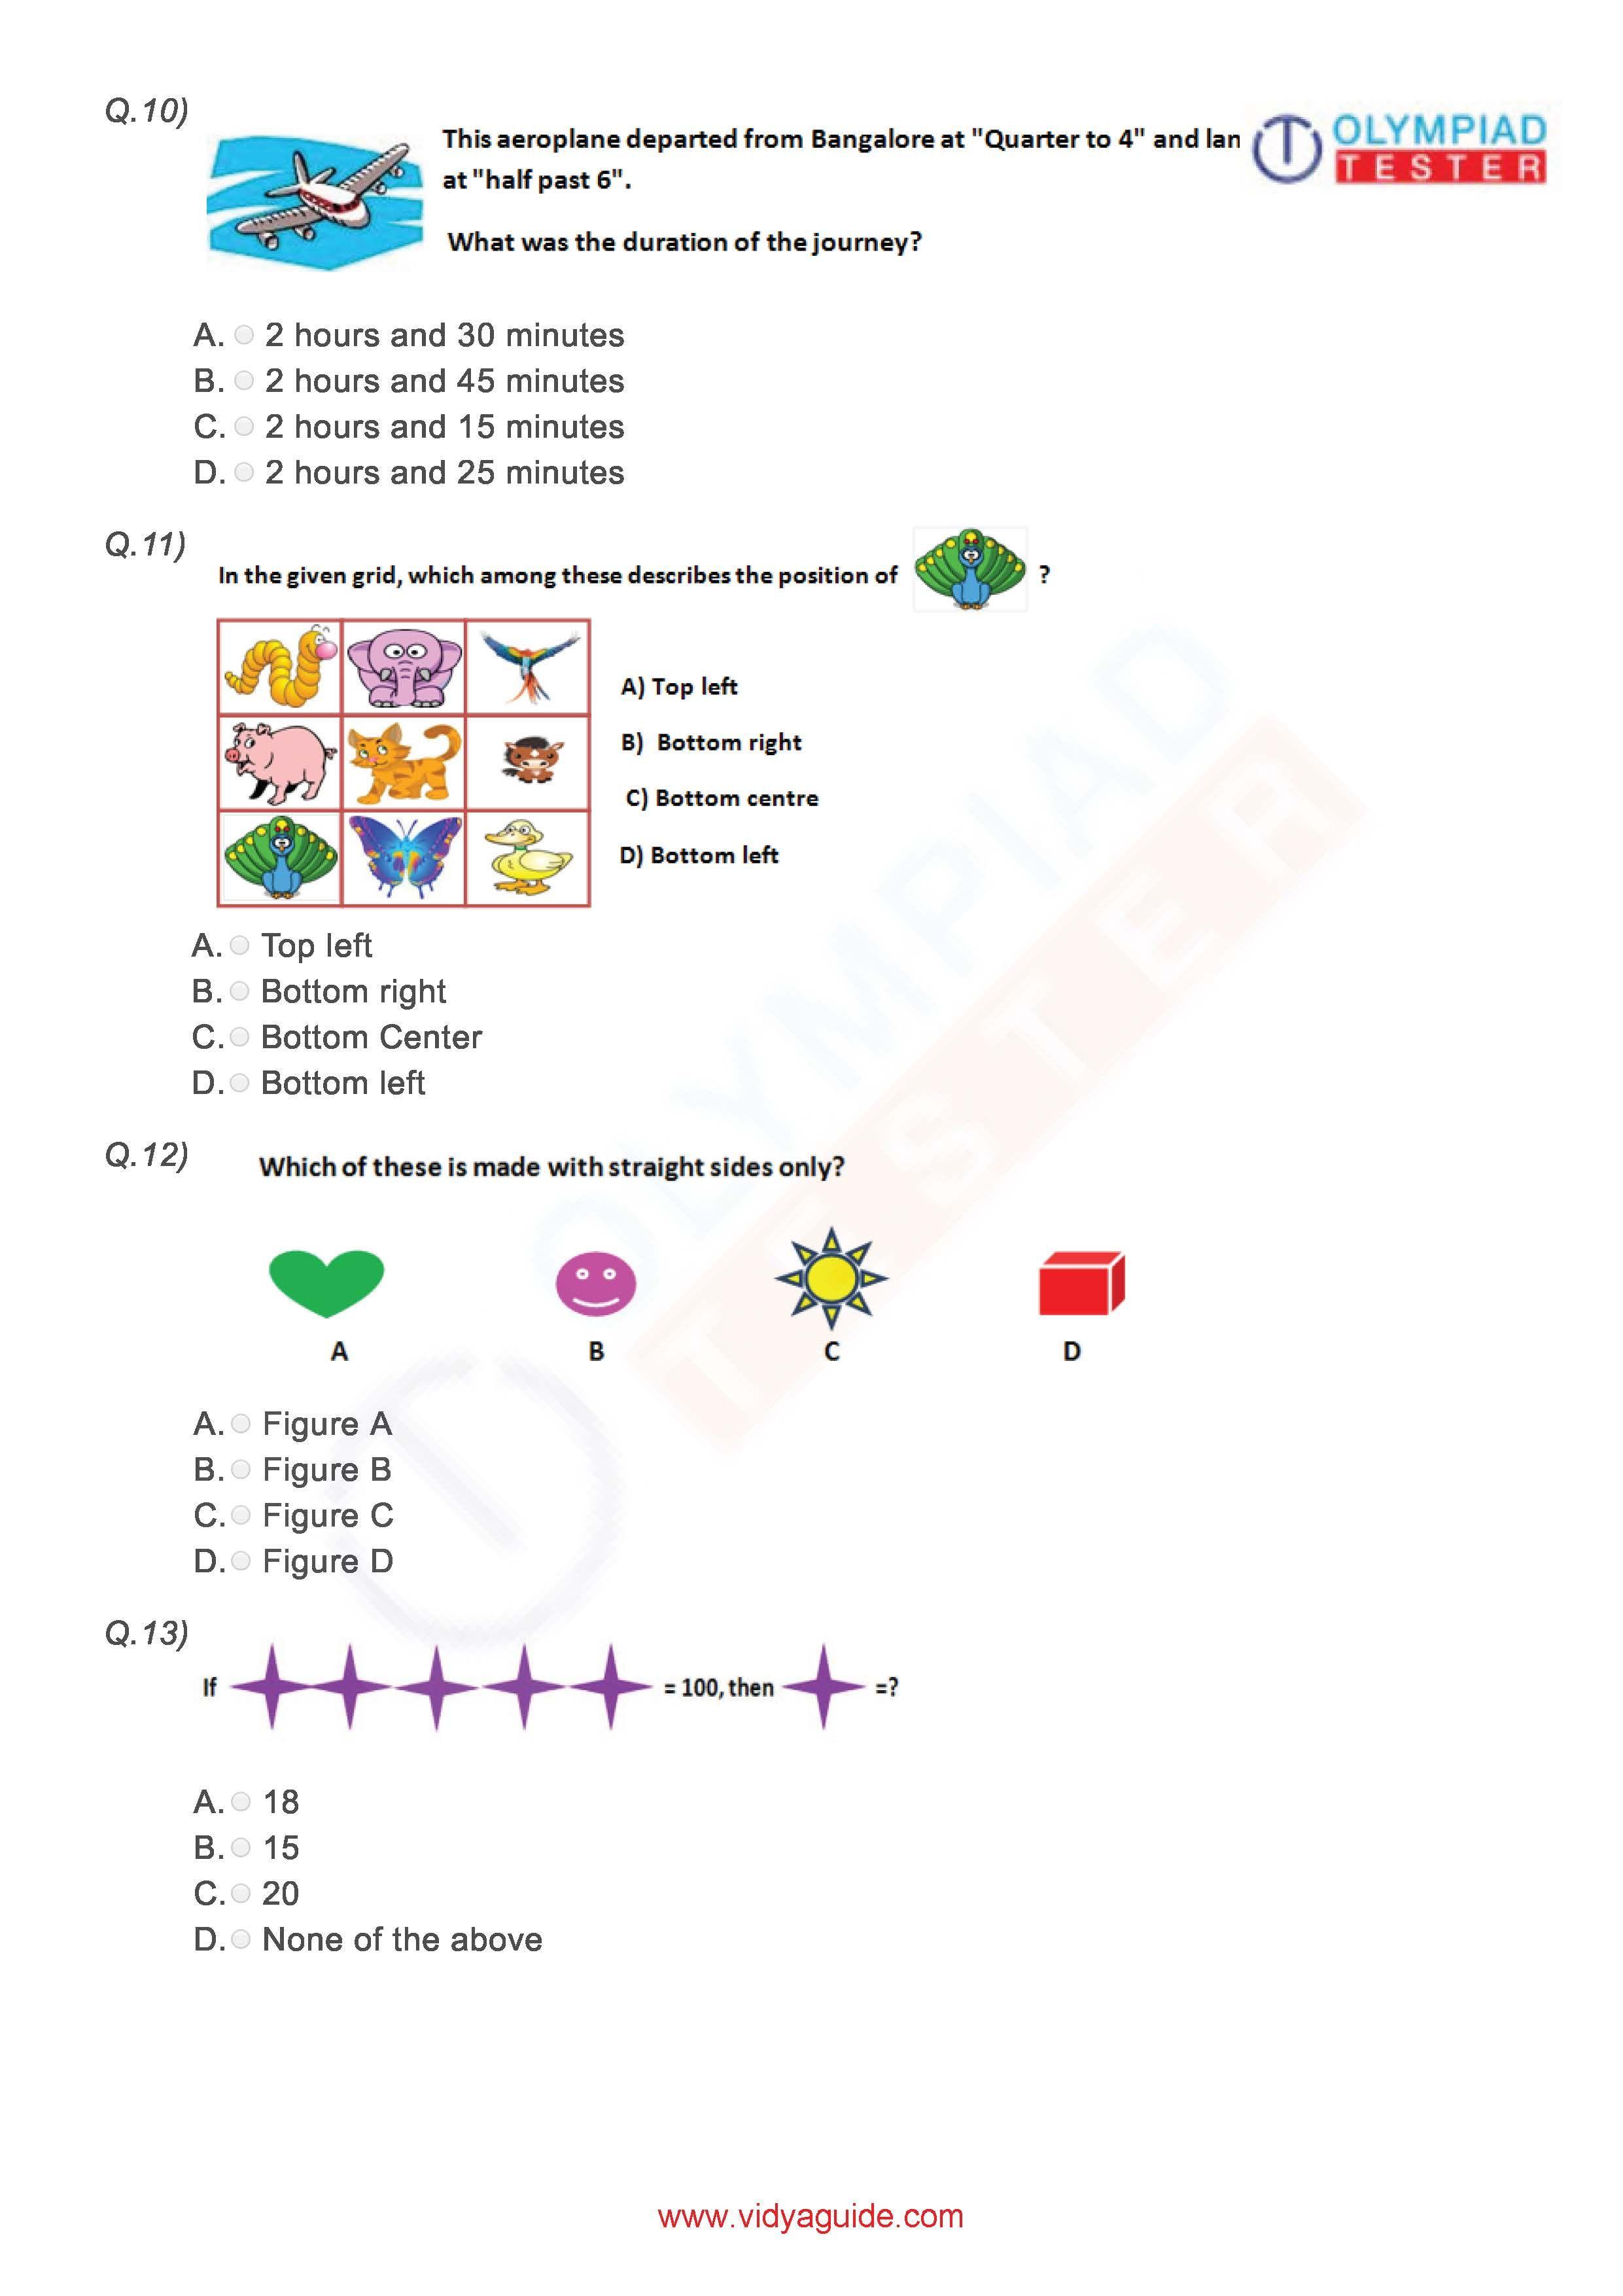 Class 3 Imo Pdf Worksheet 01 Math Olympiad Free Printable Math Worksheets Free Math Worksheets [ 3509 x 2481 Pixel ]